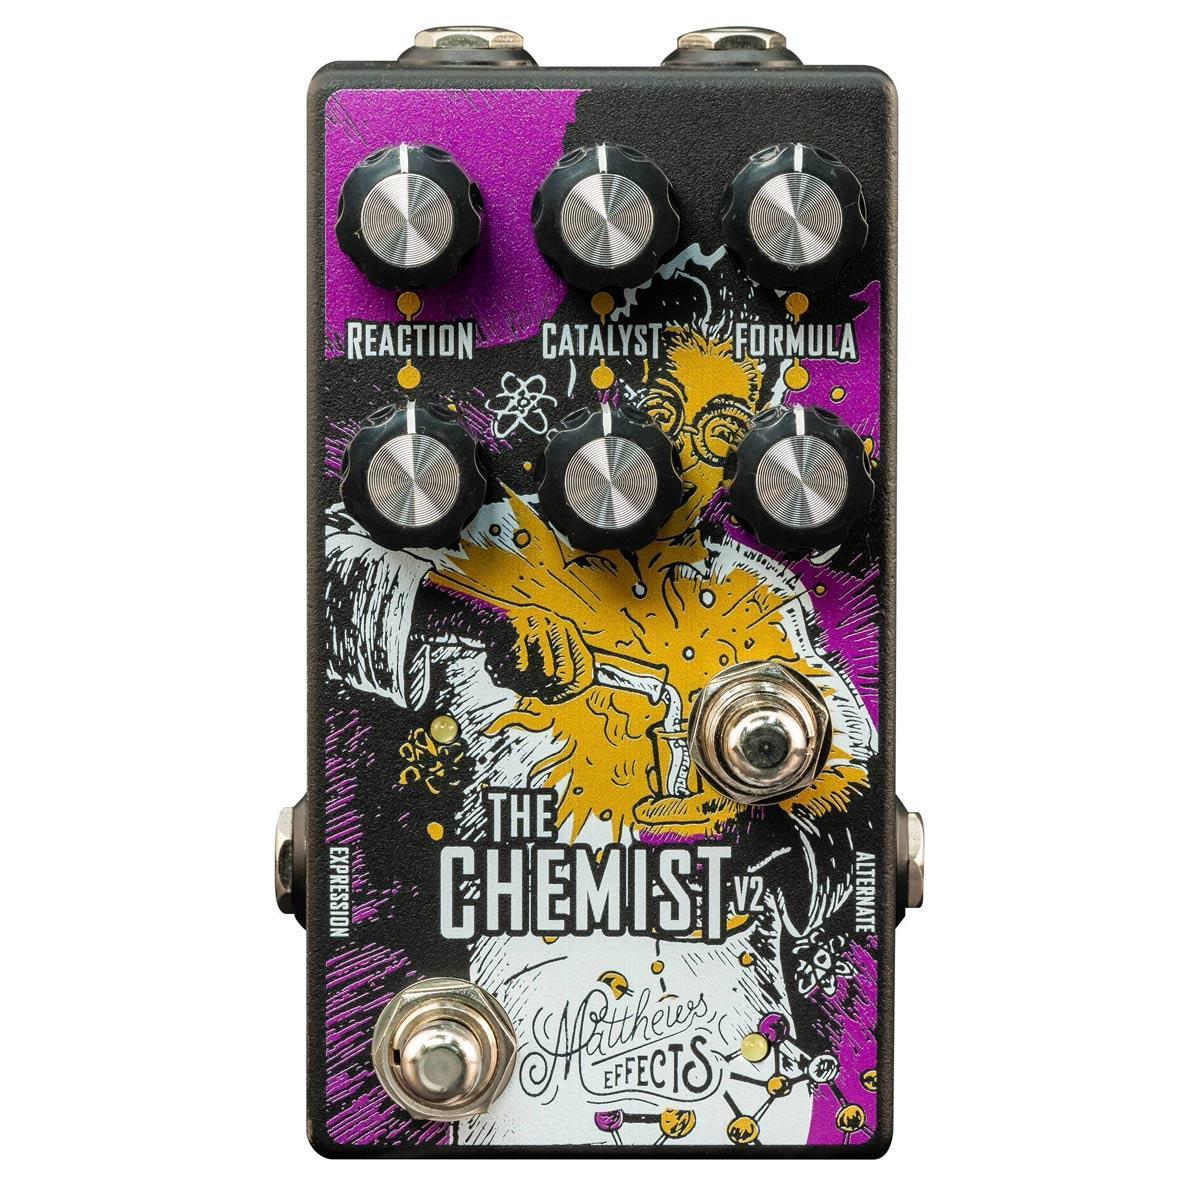 Matthews Effects Chemist v2 Atomic Modulator Octave / Chorus / Phaser pedal